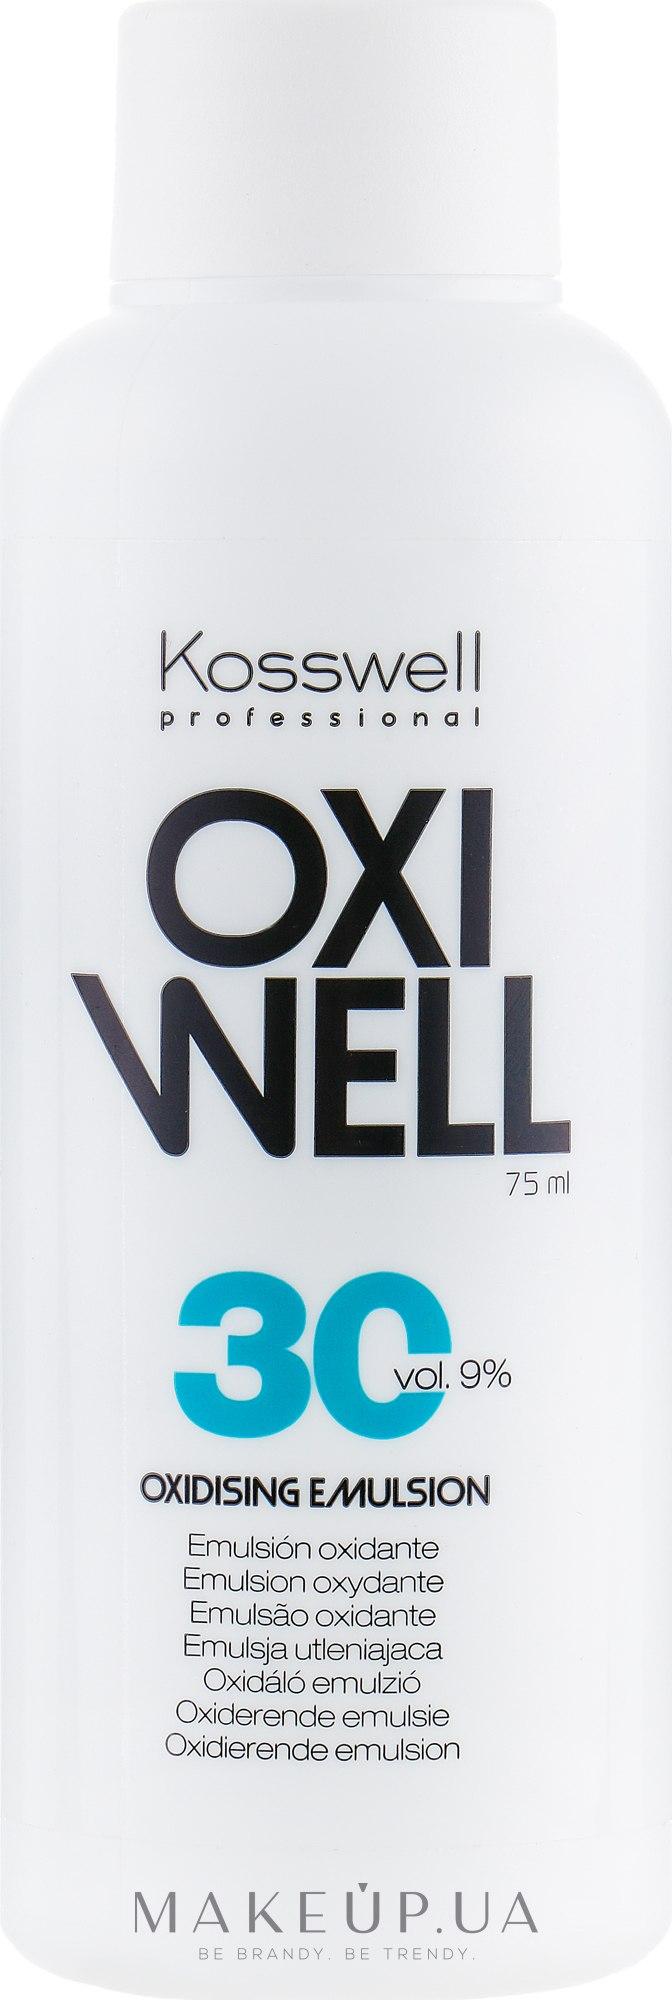 Окислительная эмульсия, 9% - Kosswell Professional Equium Oxidizing Emulsion Oxiwell 9% 30 vol — фото 75ml